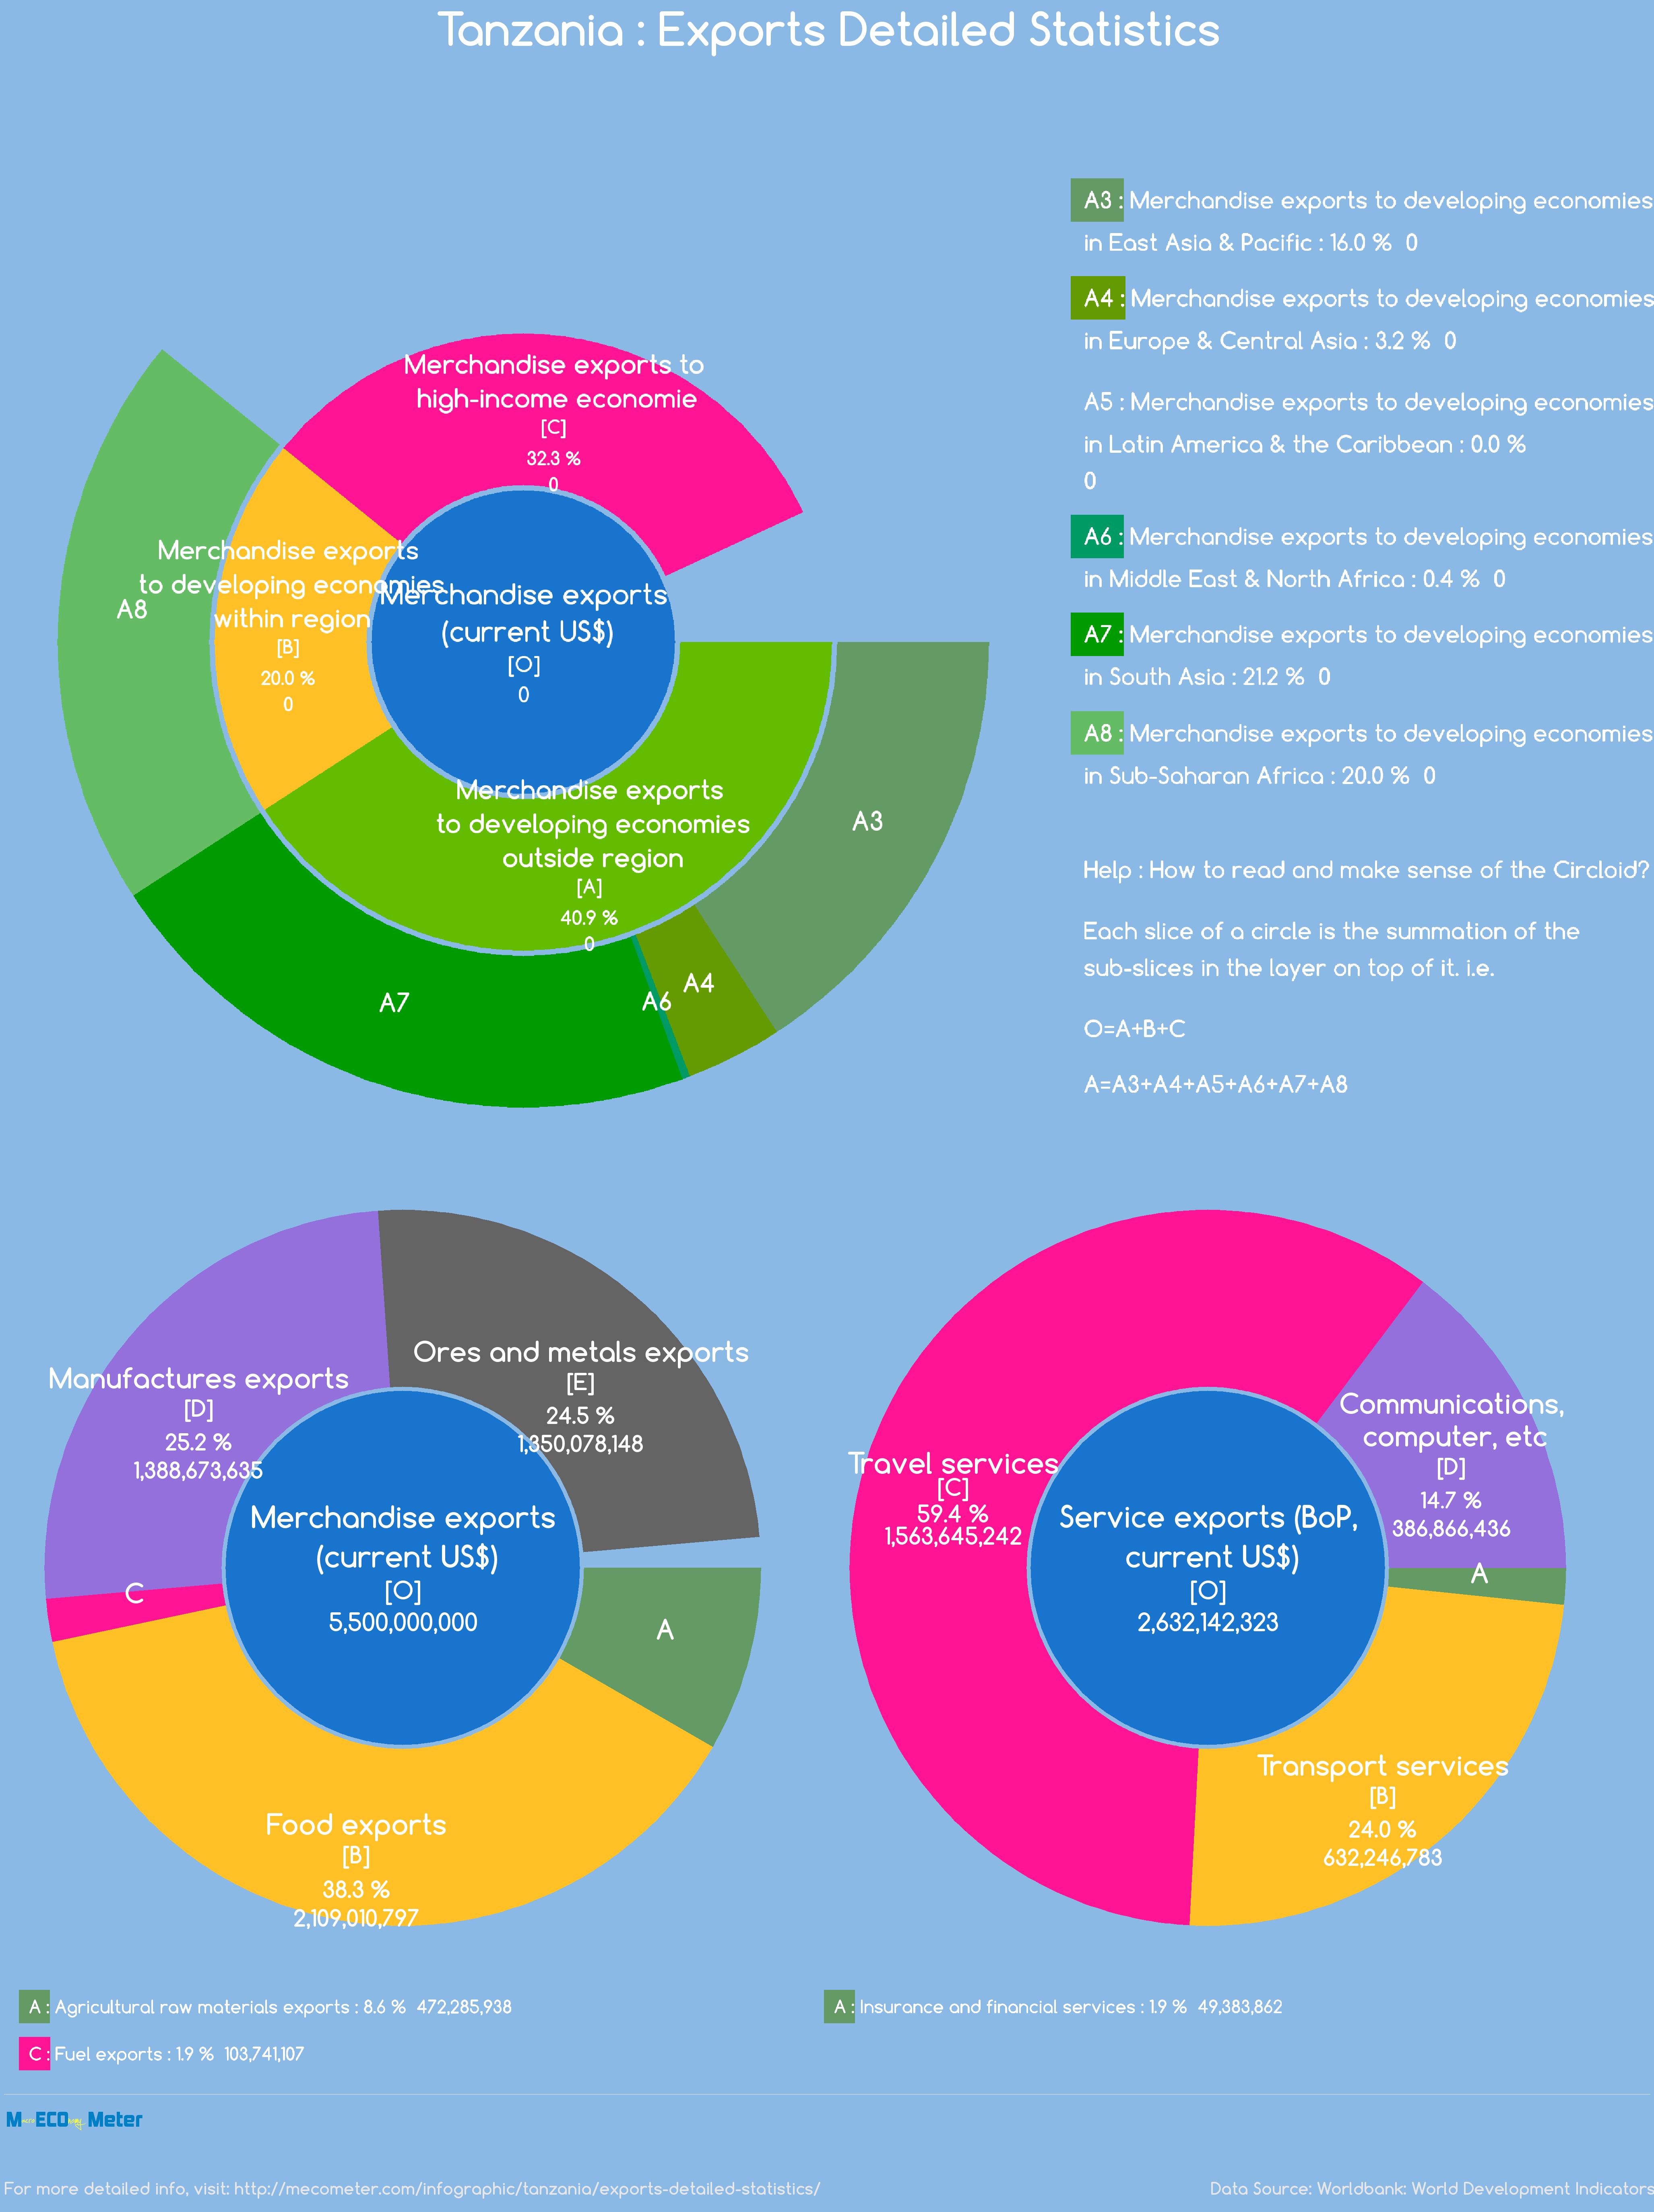 Tanzania : Exports Detailed Statistics